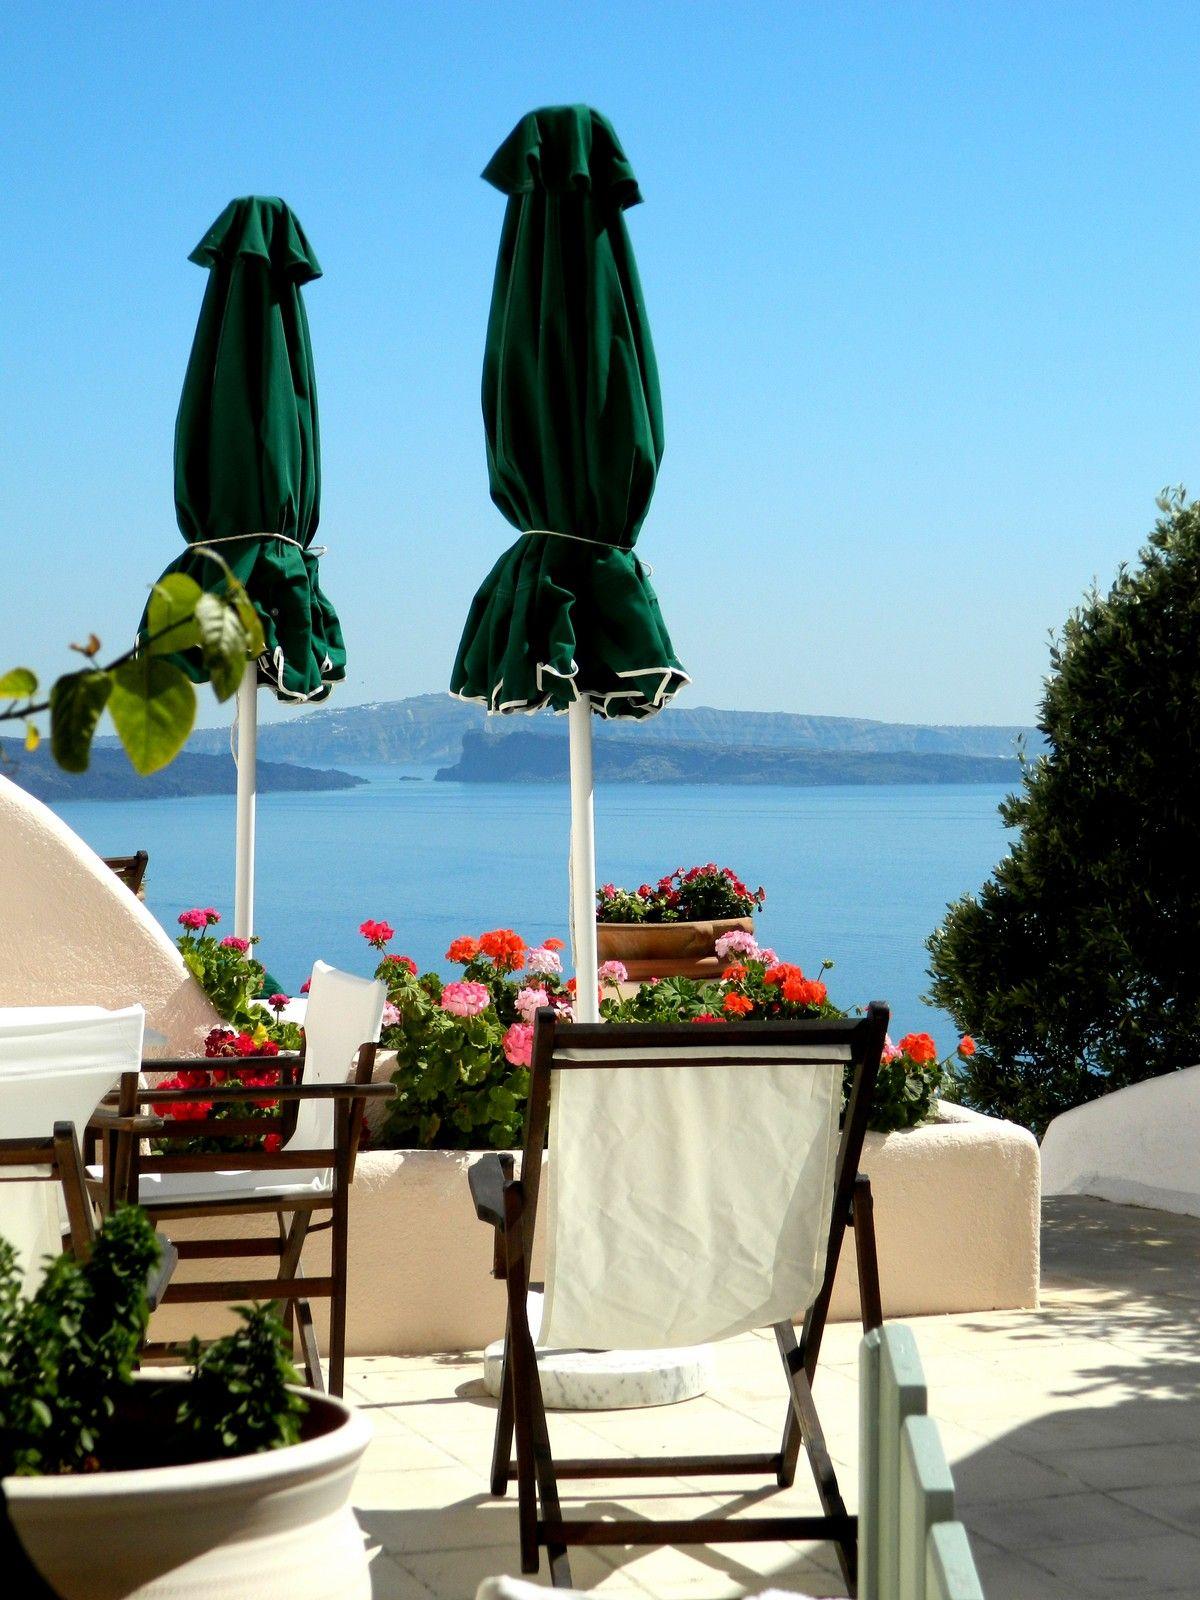 Aris Caves freshome hotel review: aris caves in oia, santorini | evimizzzz